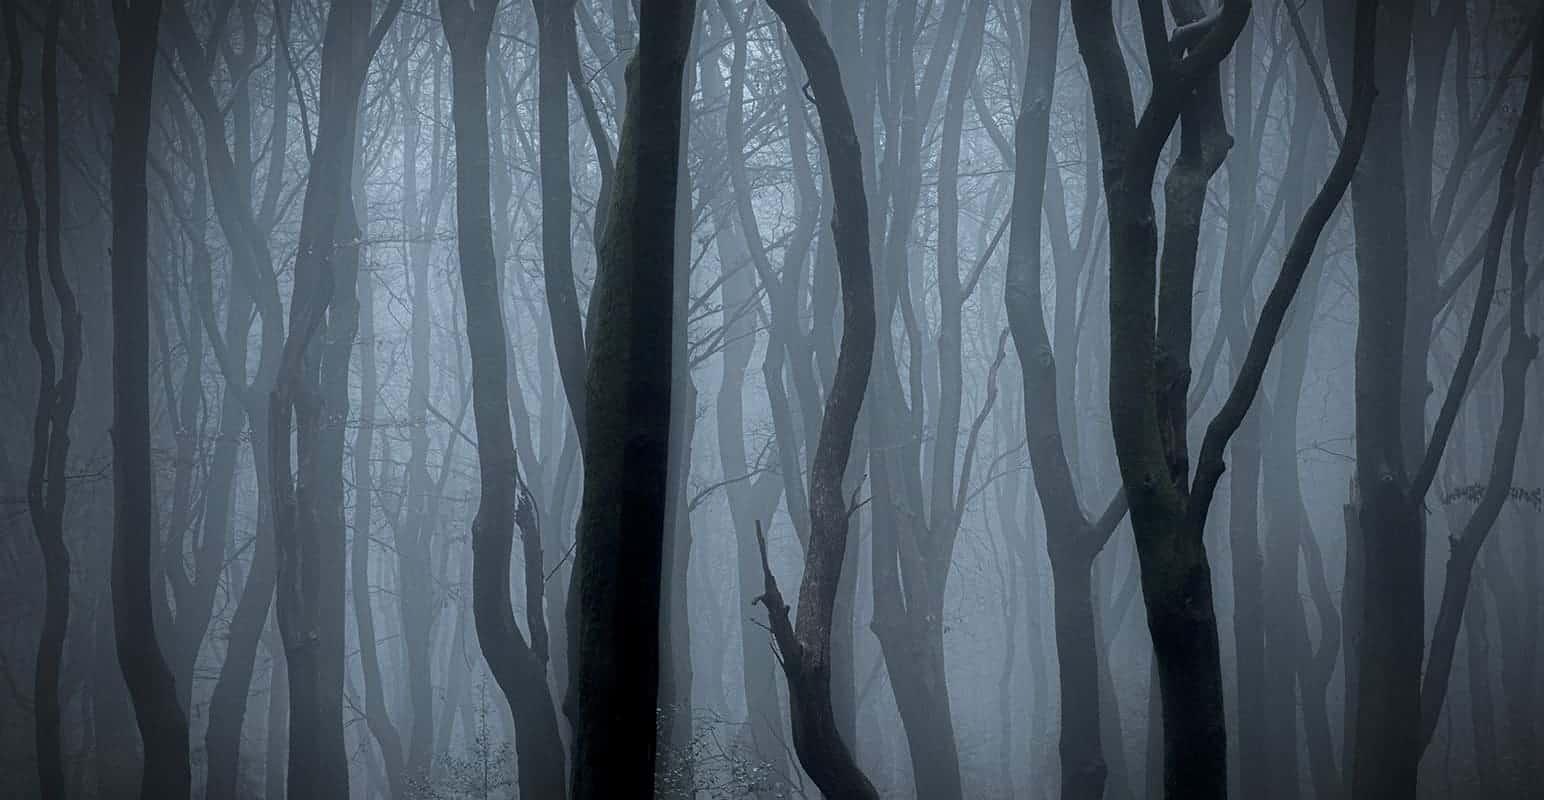 Fotoweekend Veluwe mist verkleind